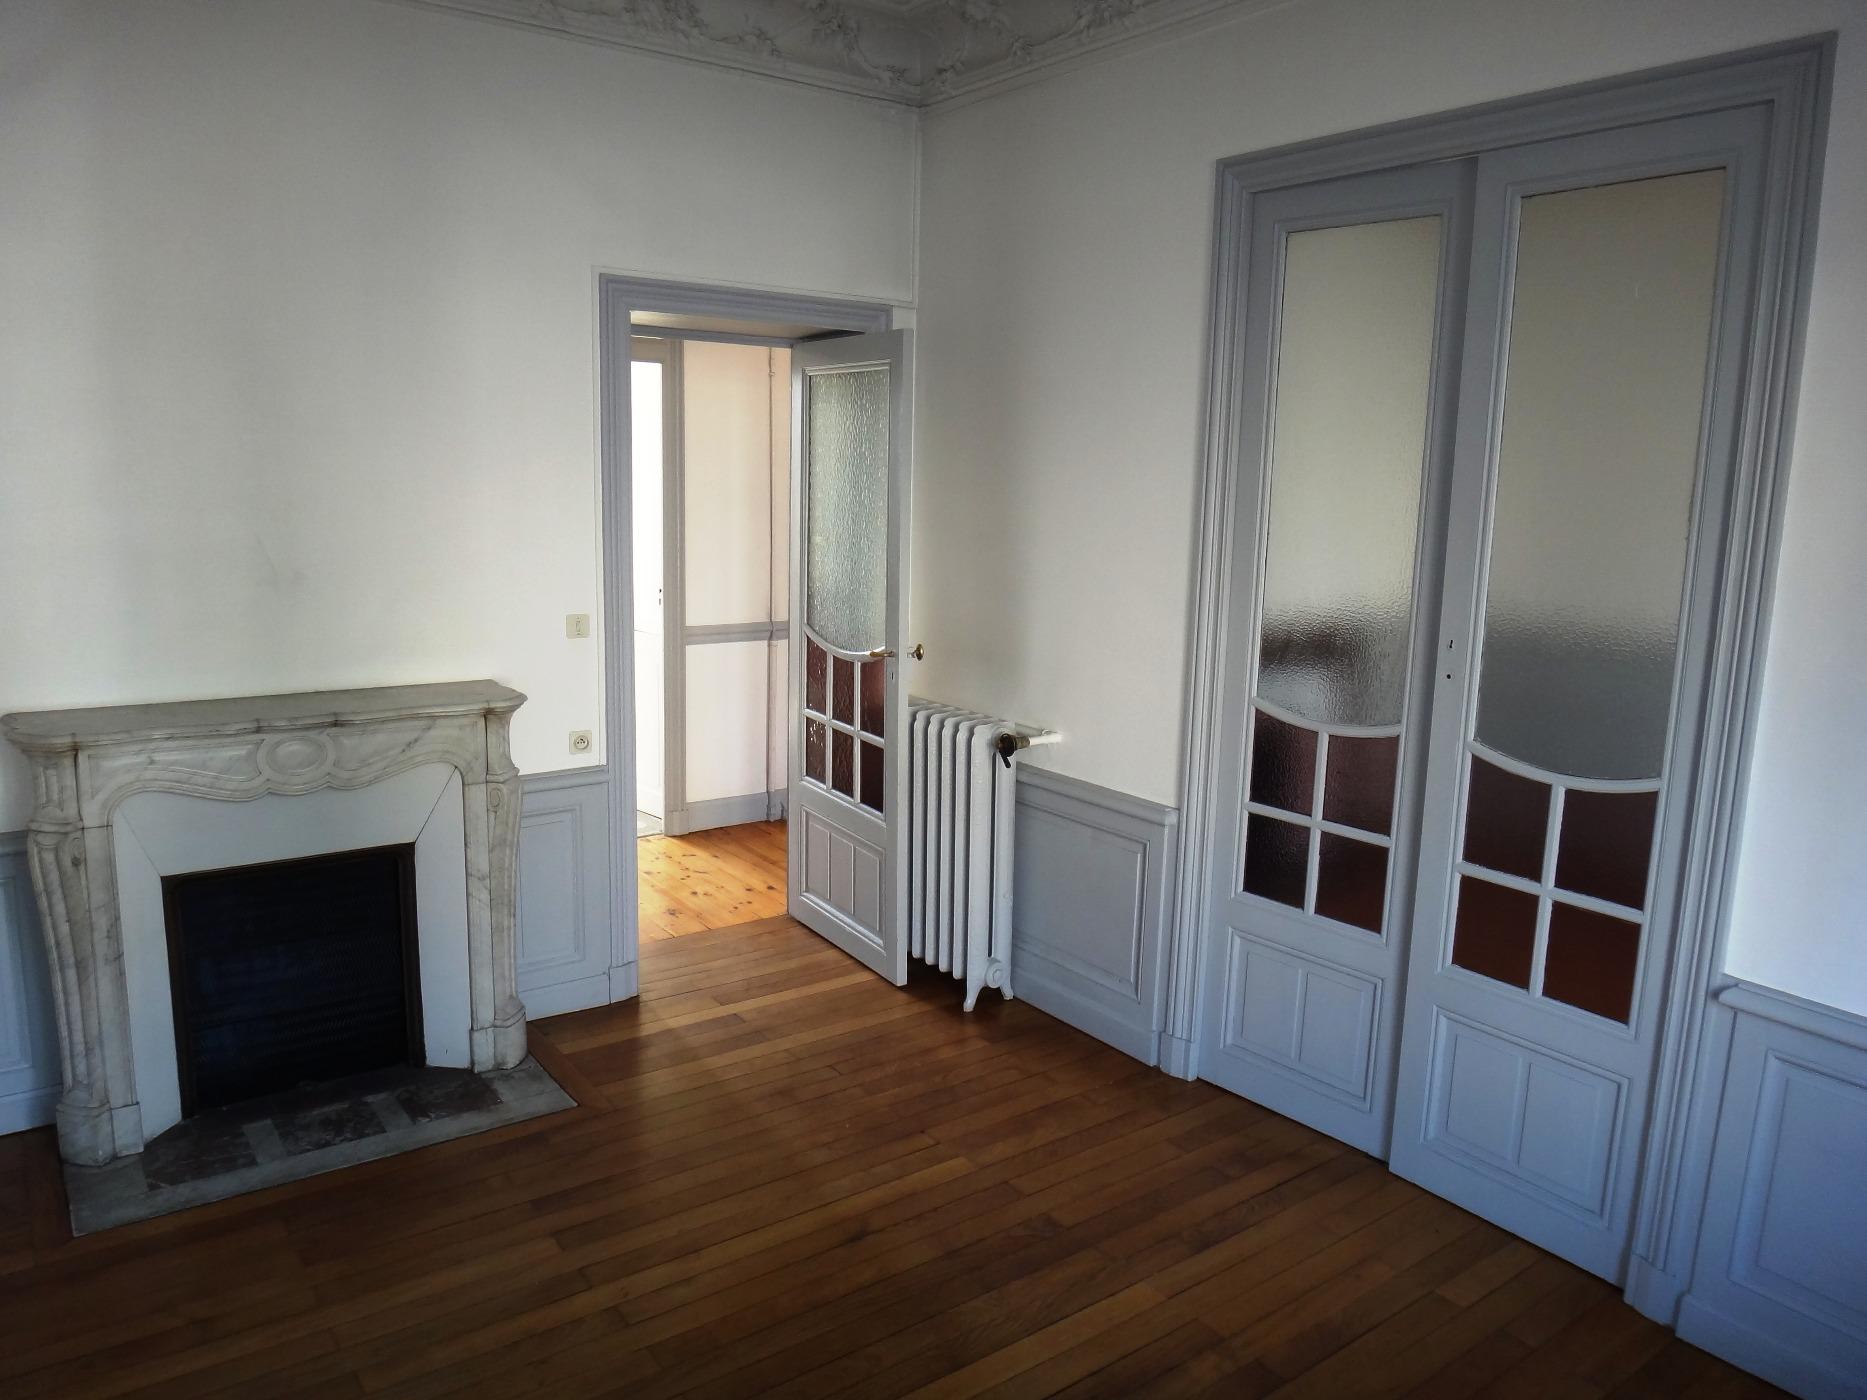 Vente immobilier professionnel location immobilier - Cabinet dentaire mutualiste clermont ferrand ...